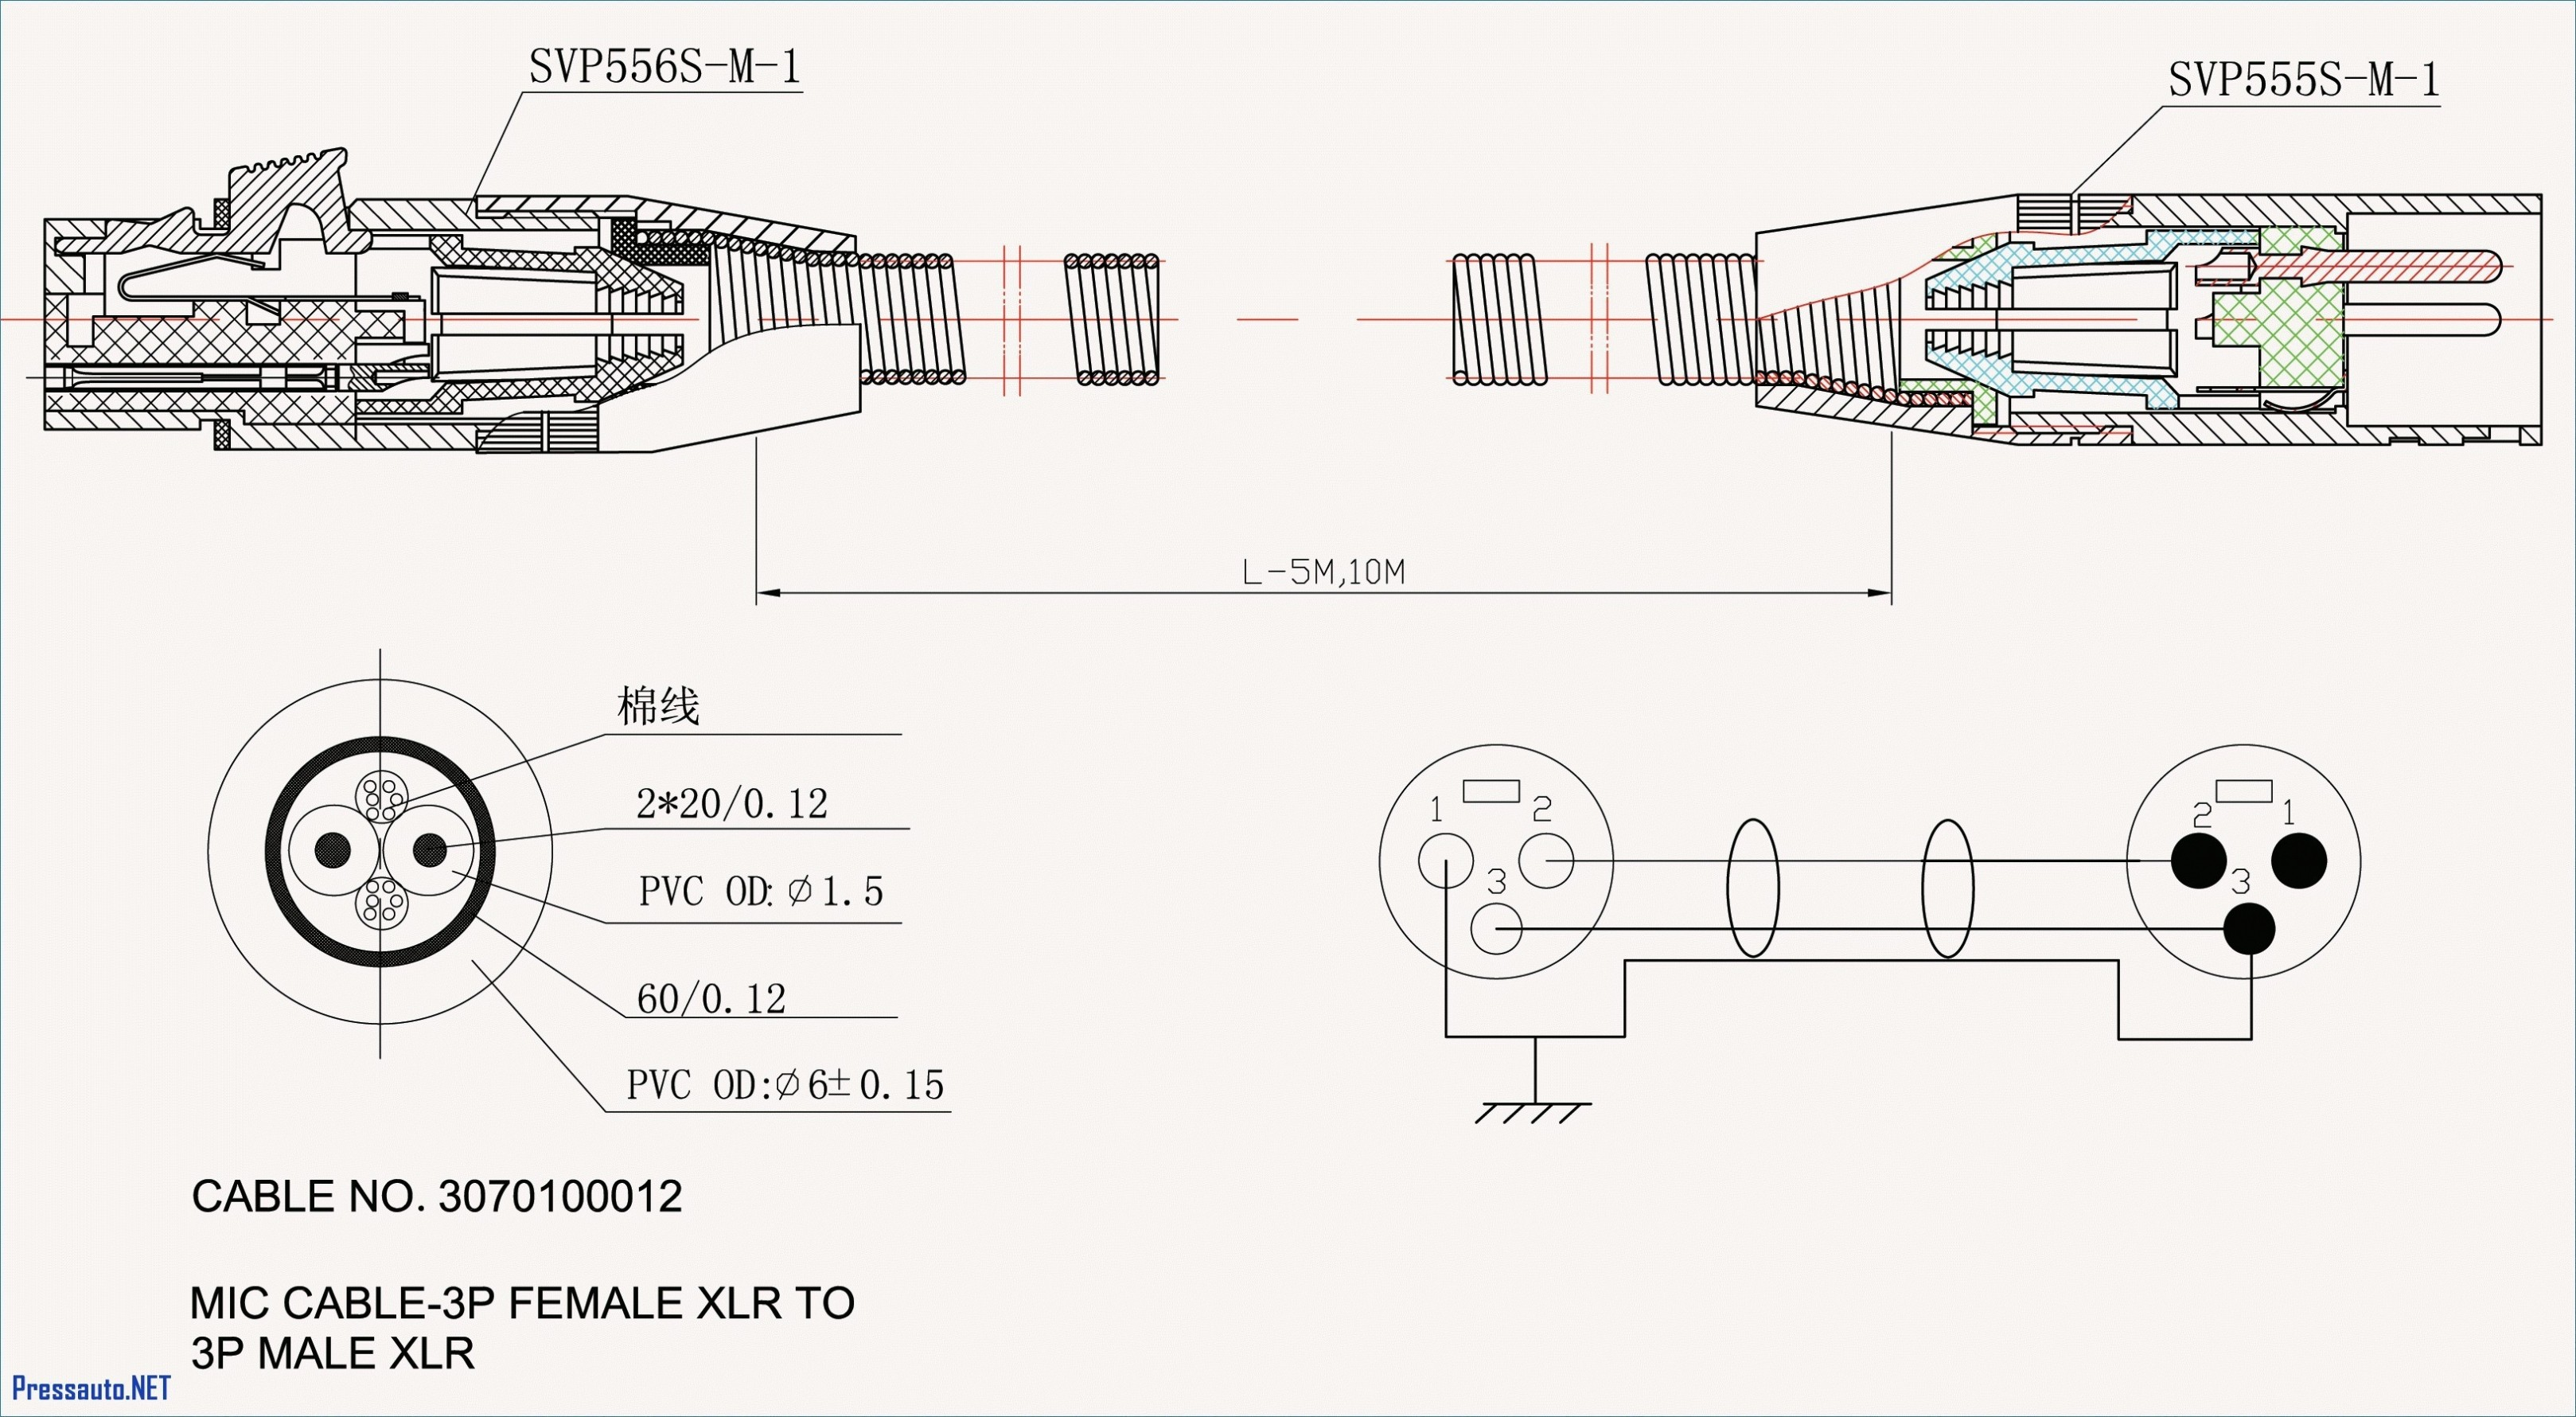 Car Spotlight Wiring Diagram | My Wiring DIagram on